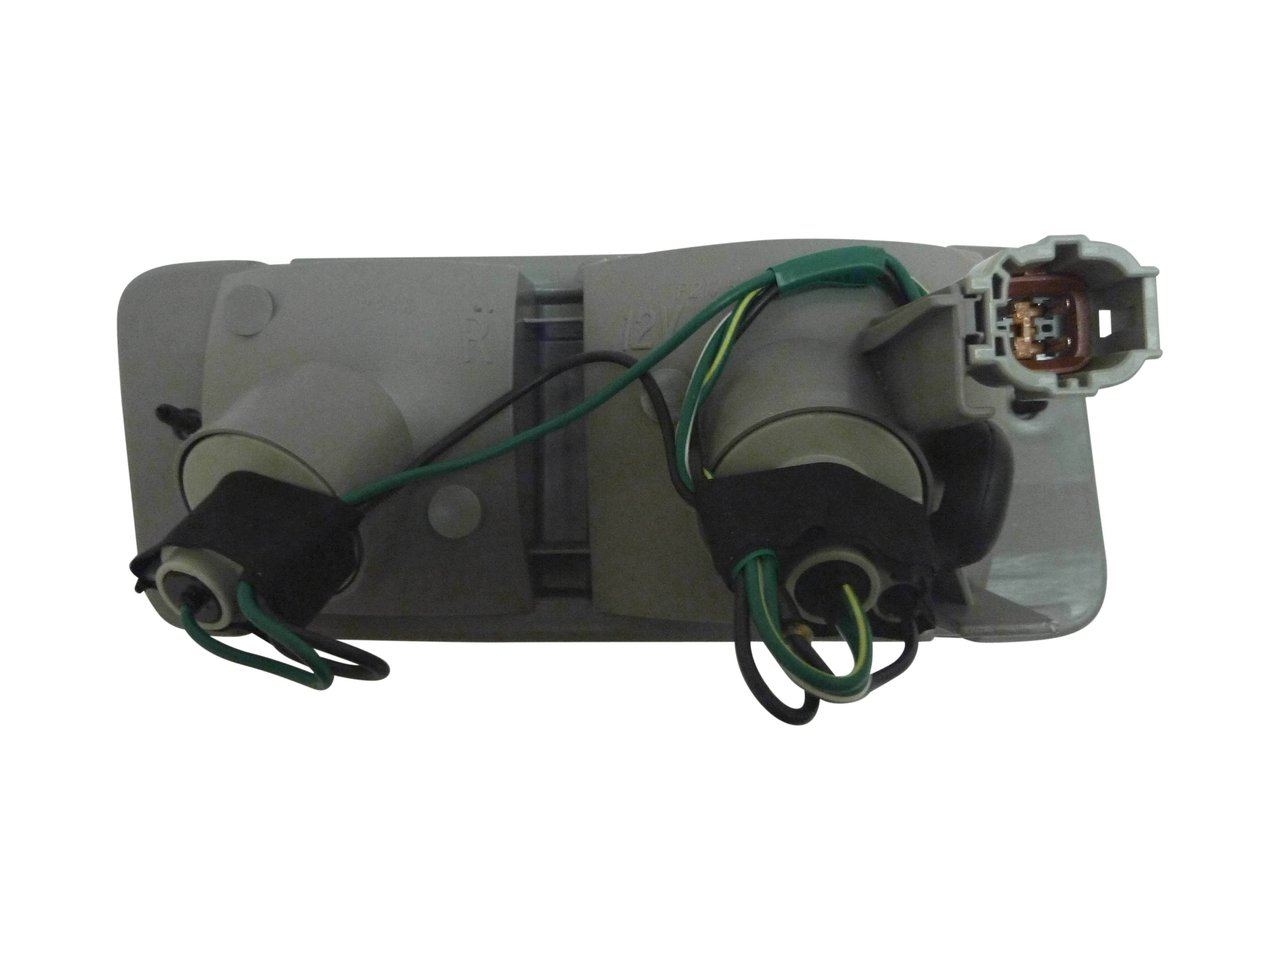 Nissan Patrol Tail Light Wiring Harness : Bumper stop tail indicator lamp for nissan patrol gu y